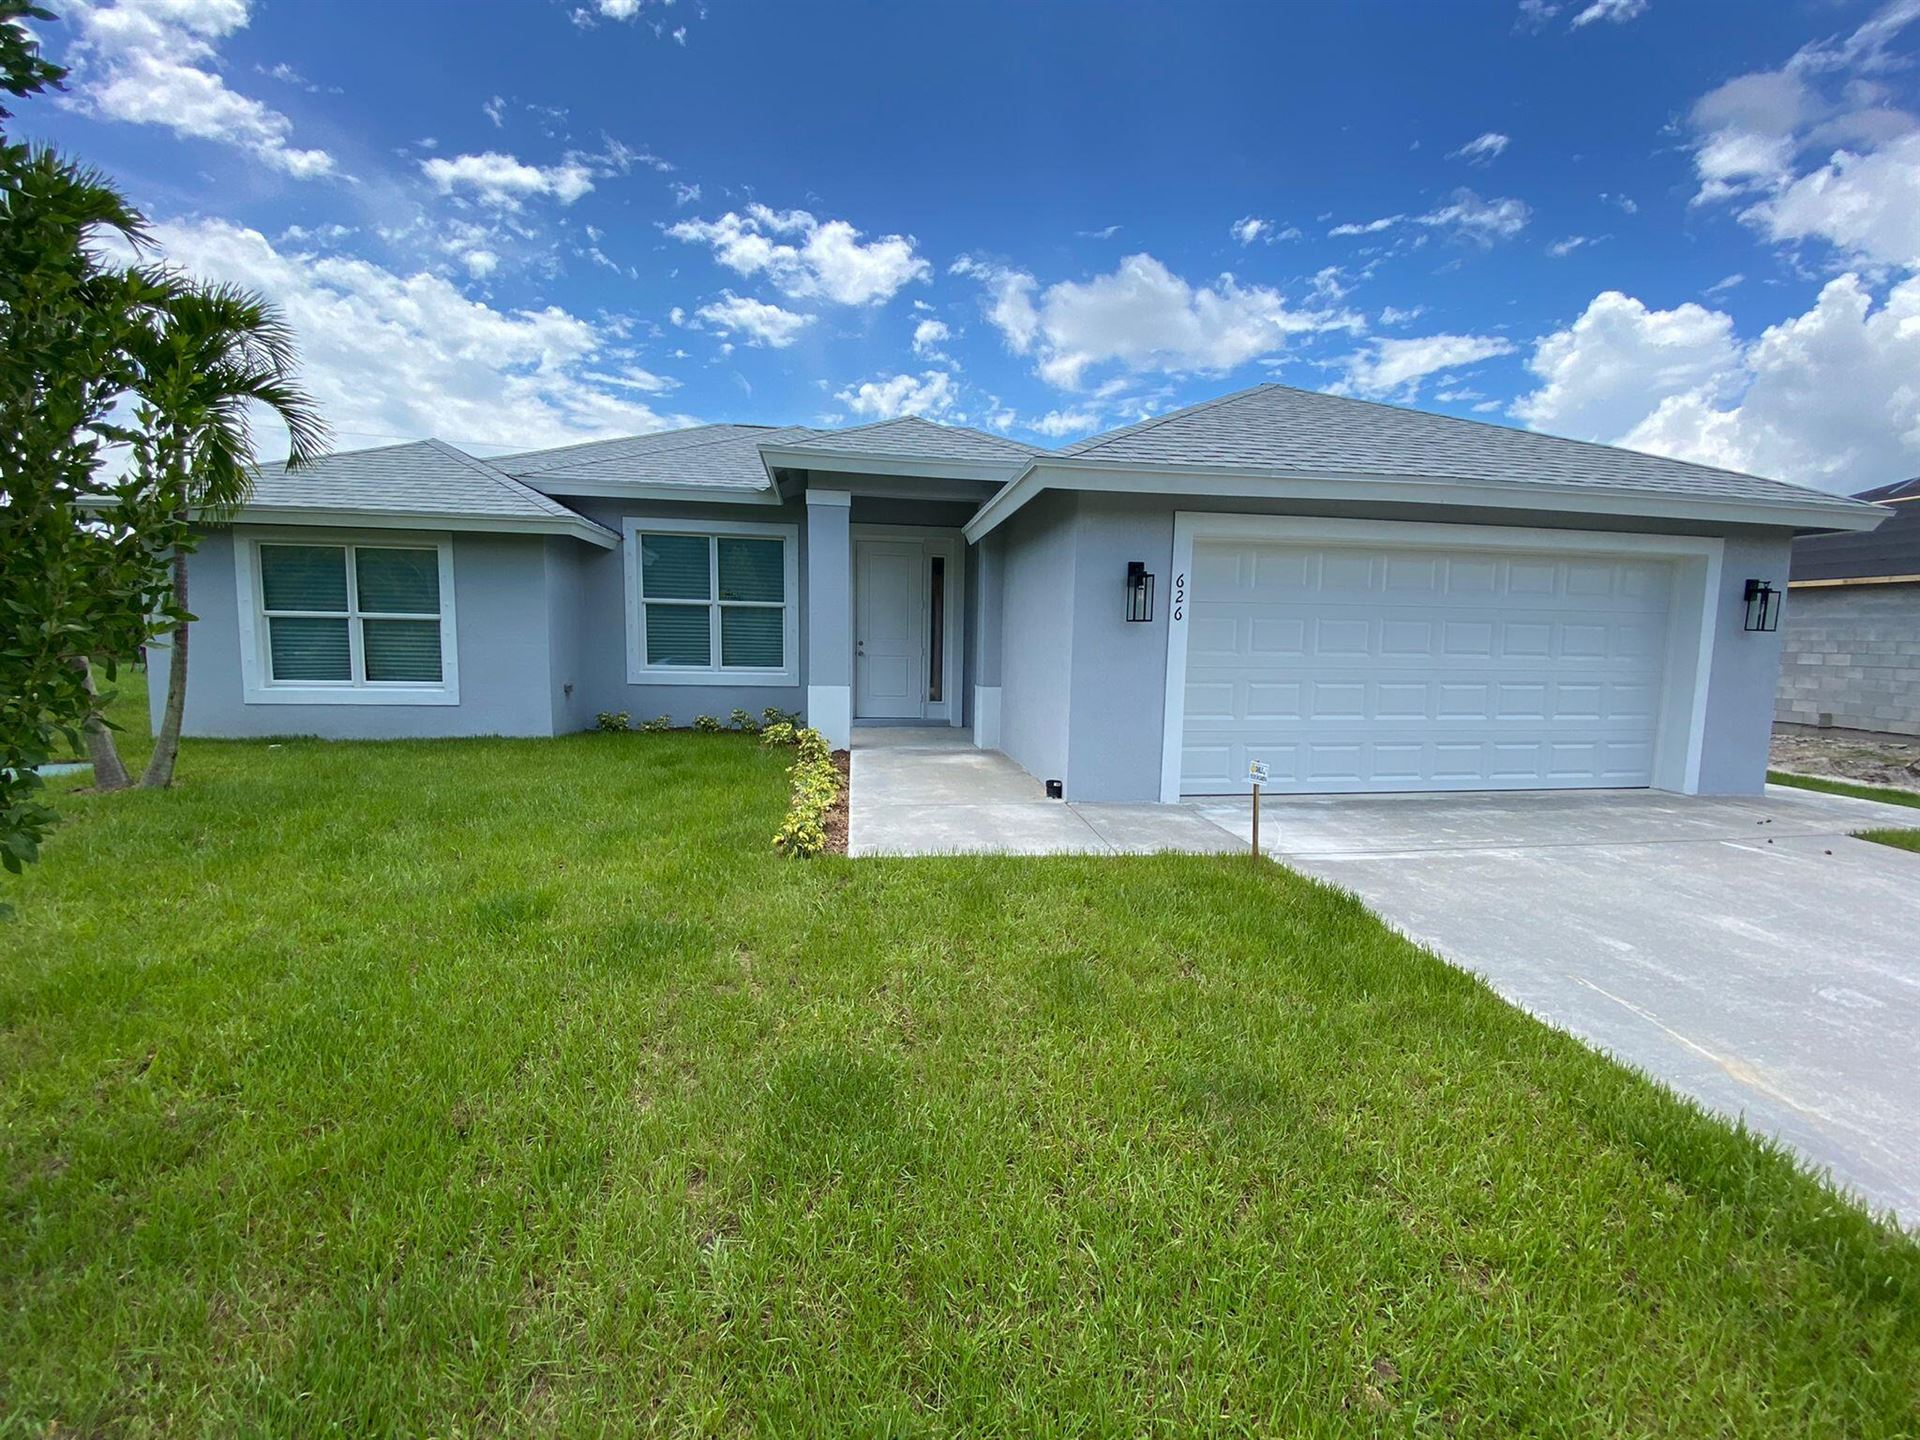 626 SE Karrigan Terrace, Port Saint Lucie, FL 34983 - MLS#: RX-10727245